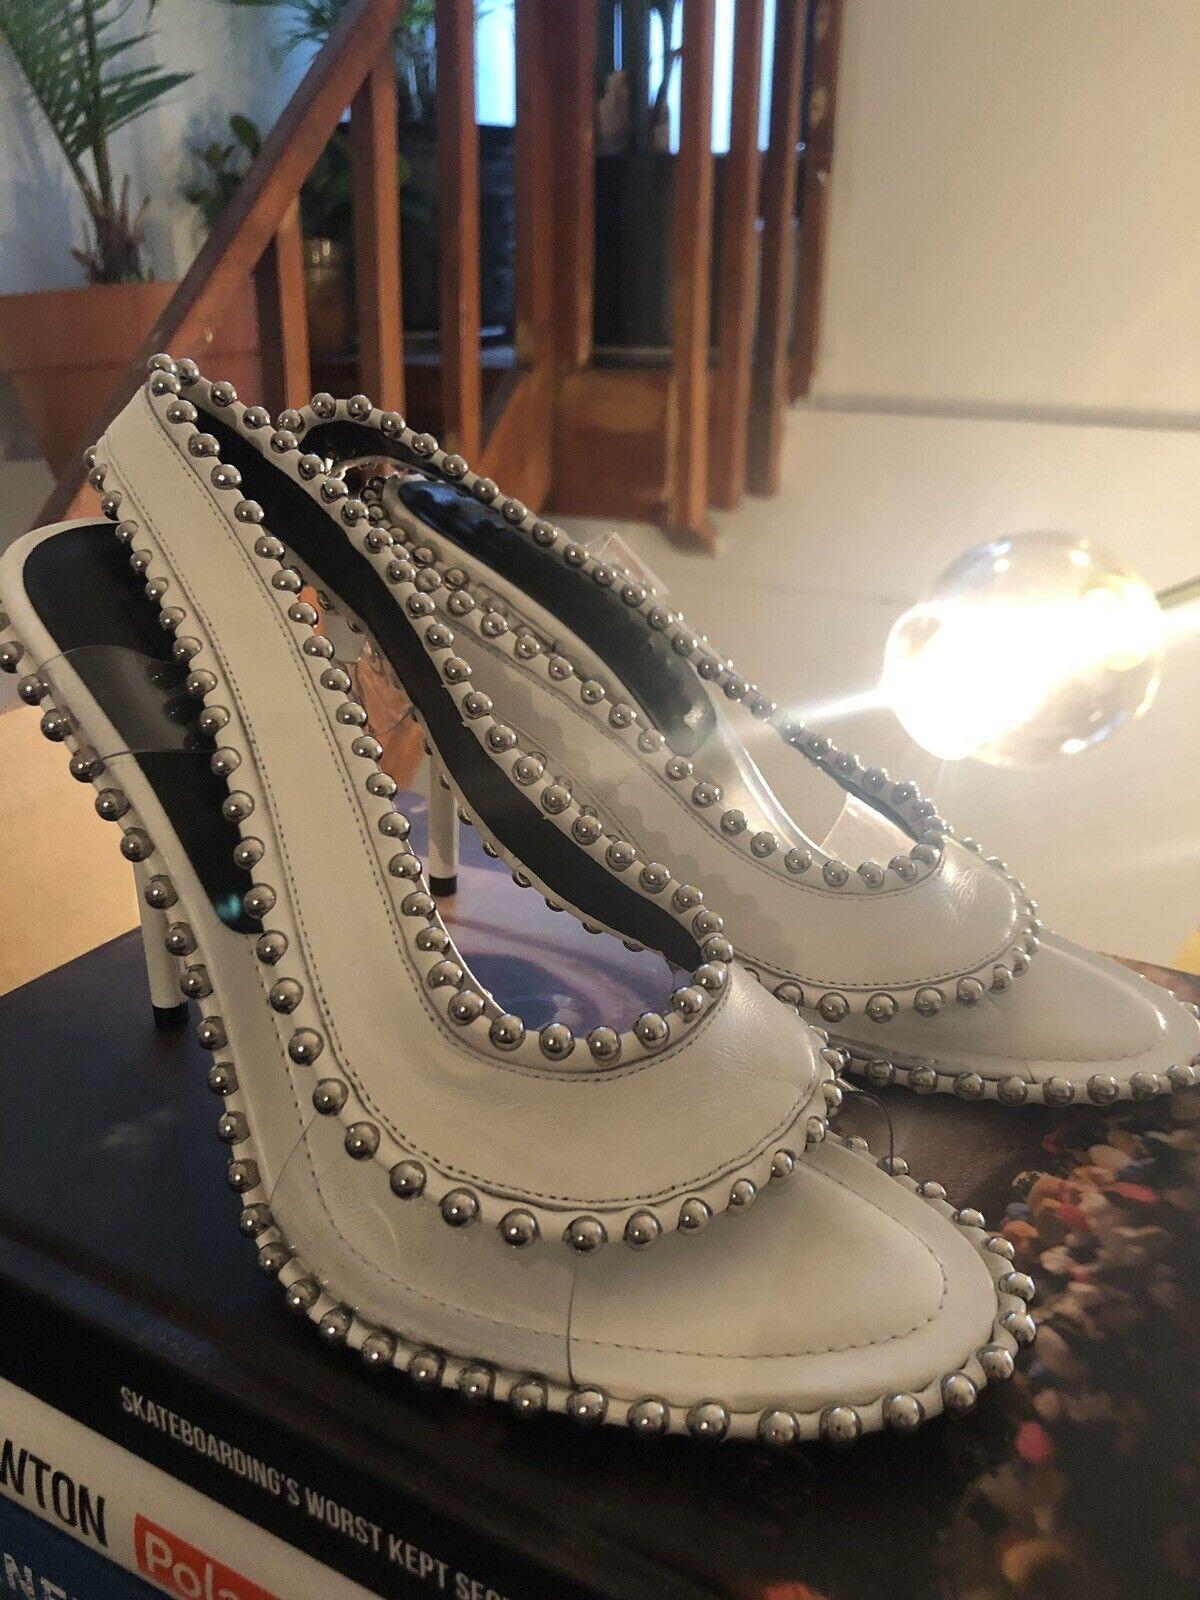 Alexander  Wang bianca Studded Stiletto Sandals Dimensione 39  migliori prezzi e stili più freschi